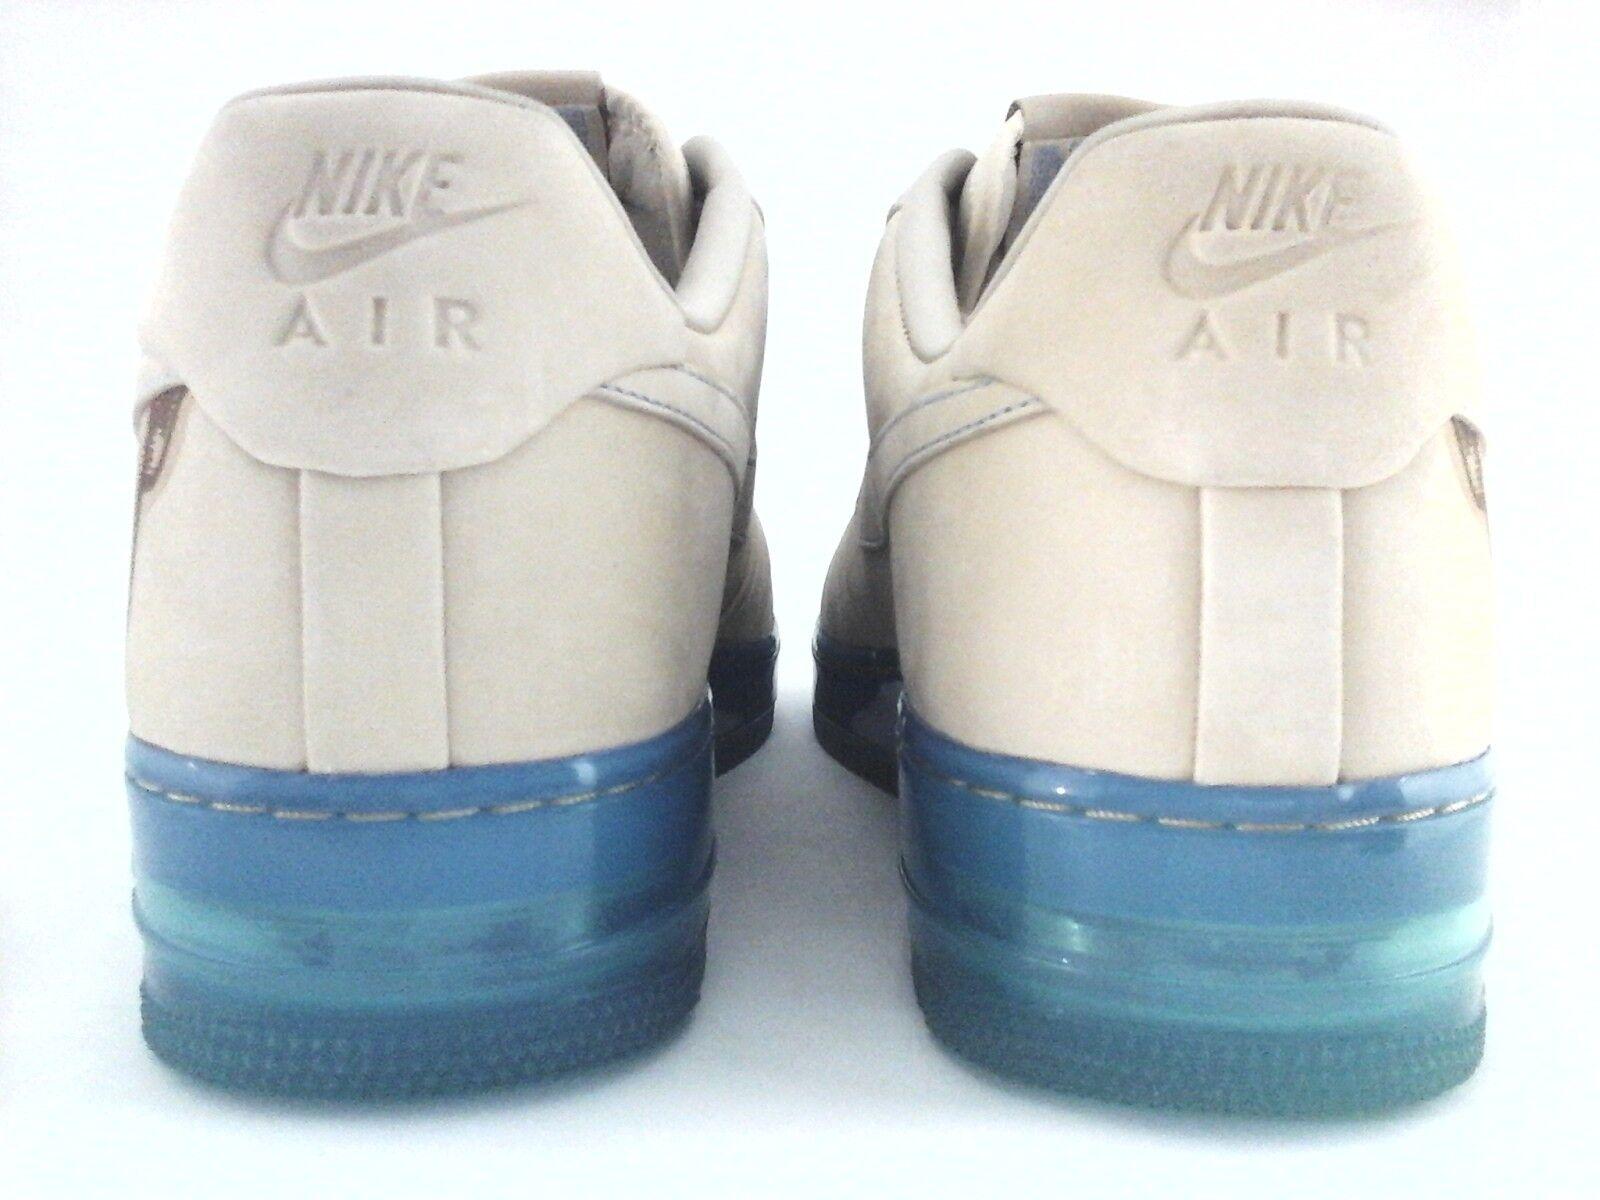 NIKE Lakers Chaussures KOBE BRYANT Lakers NIKE 8 Sand/Bleu Soles Baskets Hommes US 12 EU 46 RARE fccc86